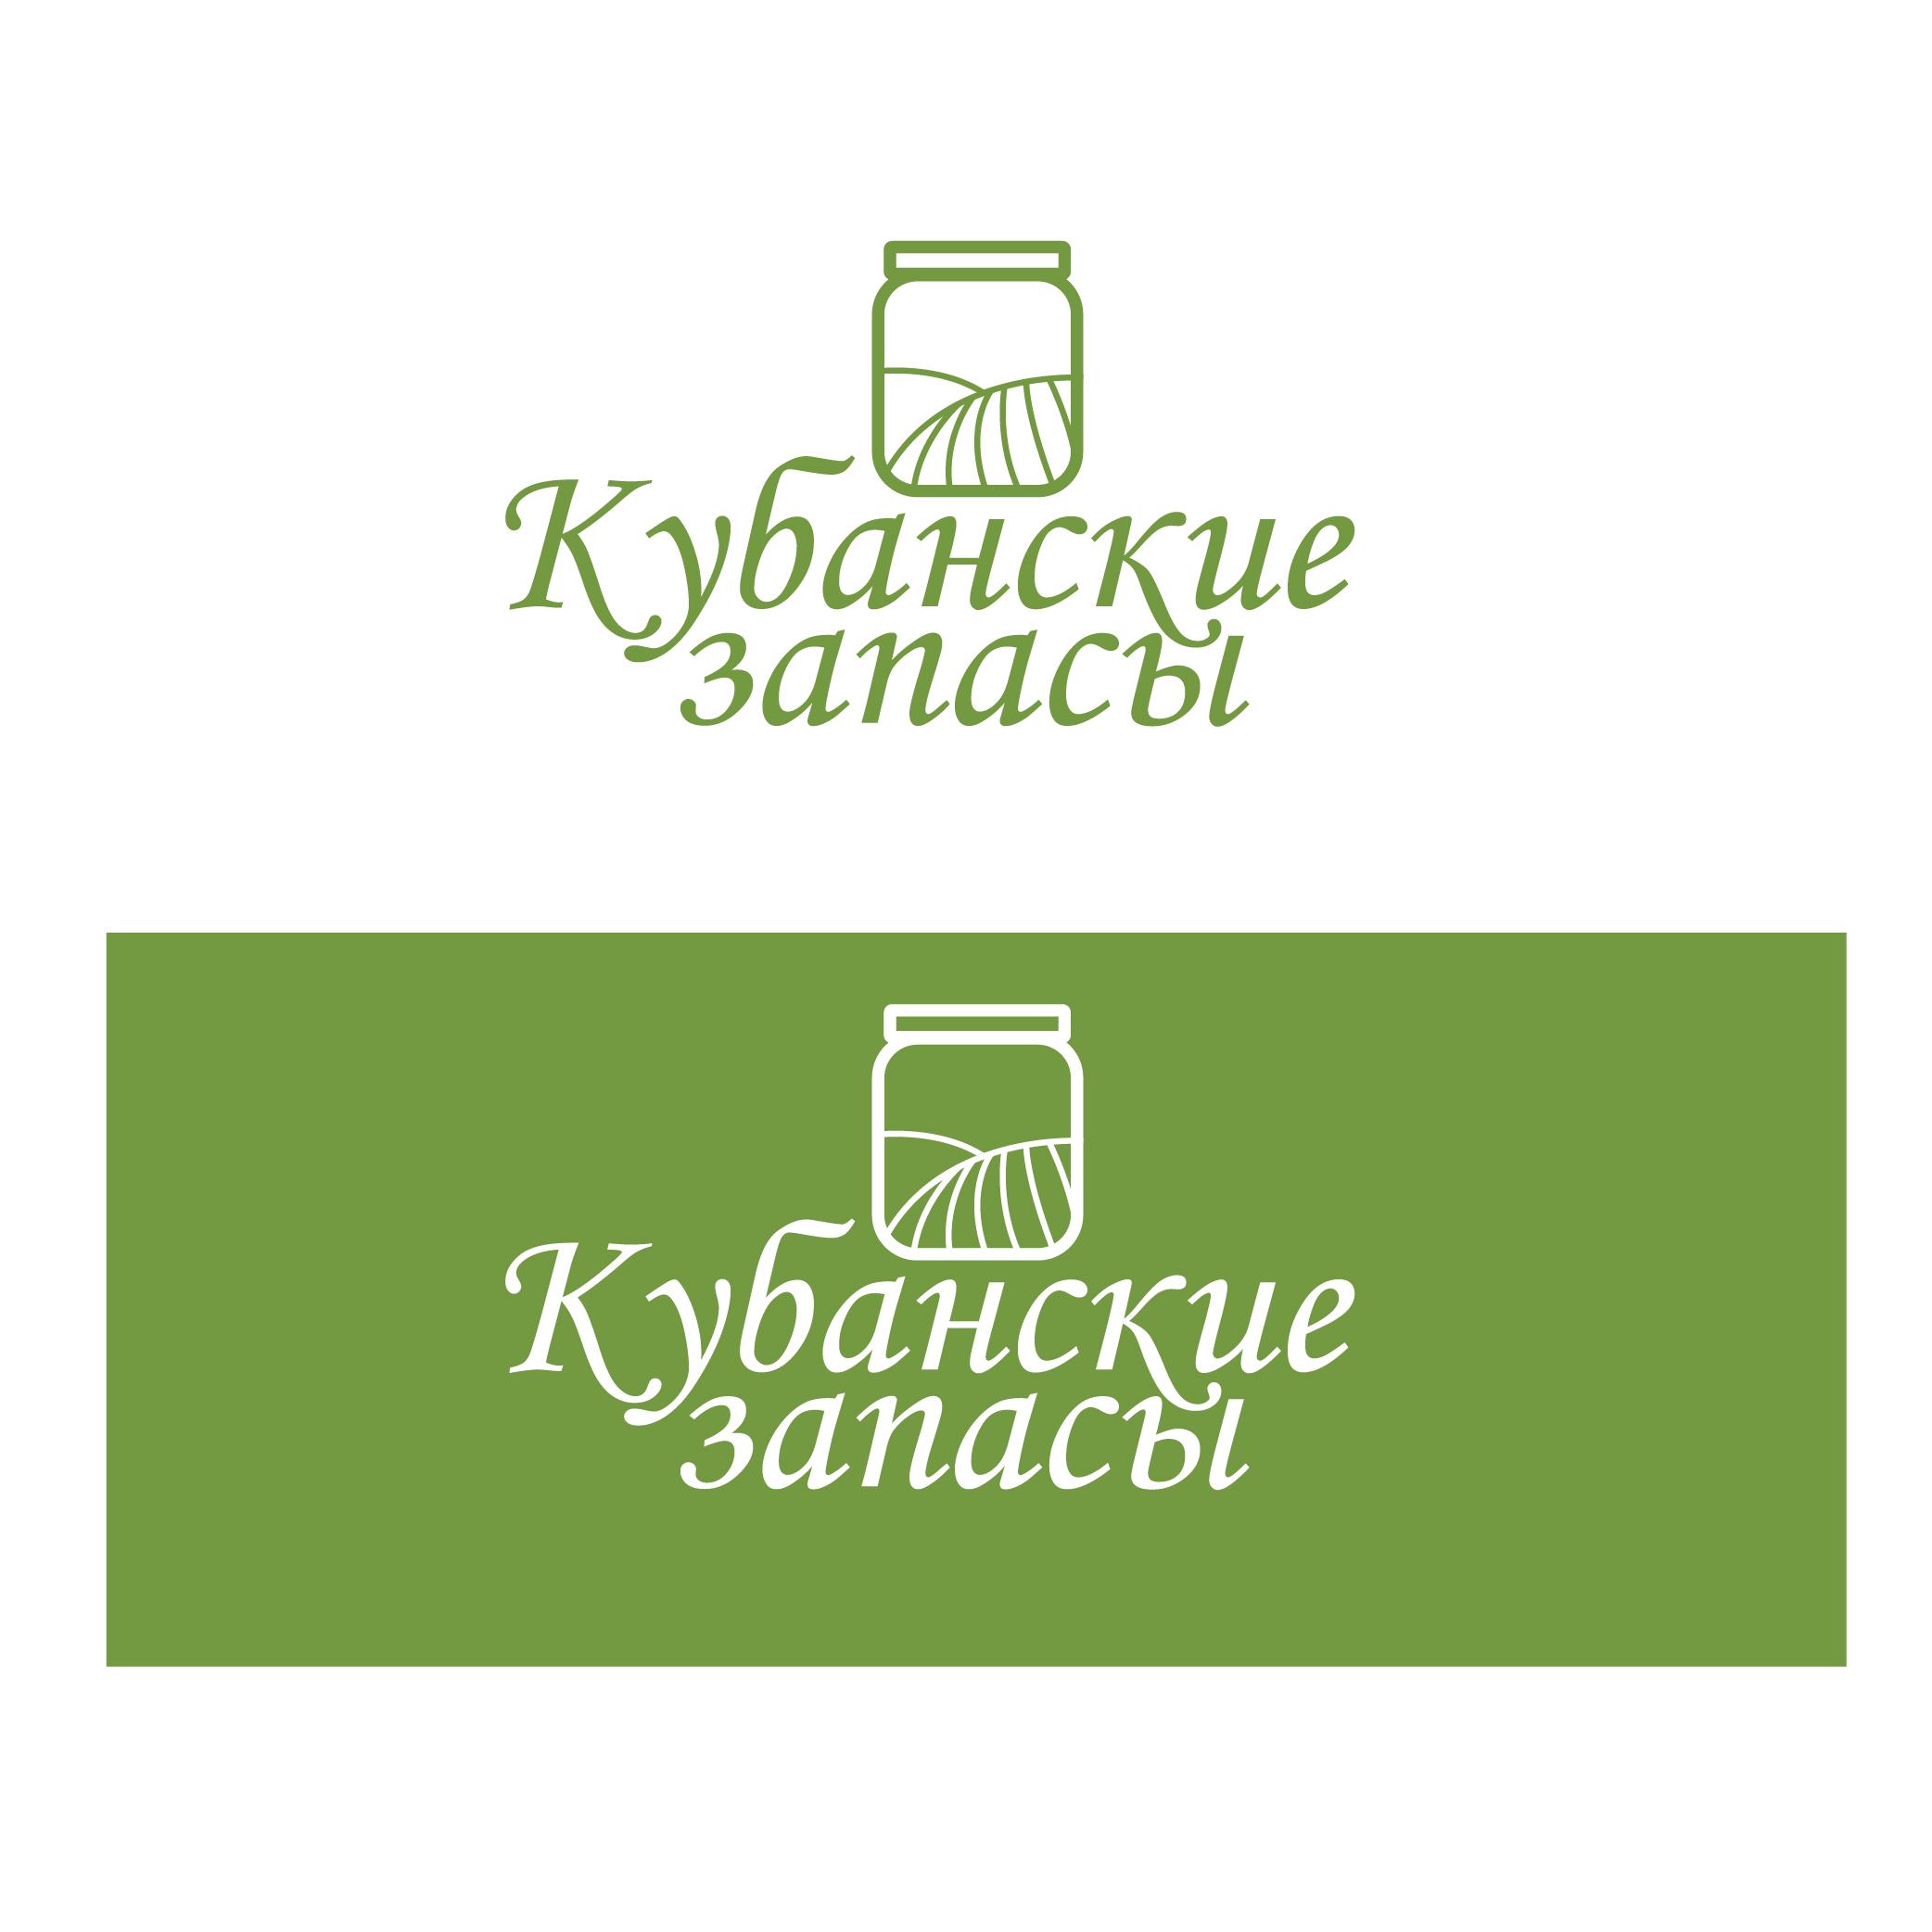 Логотип, фирменный стиль фото f_9145de482e759a3a.jpg